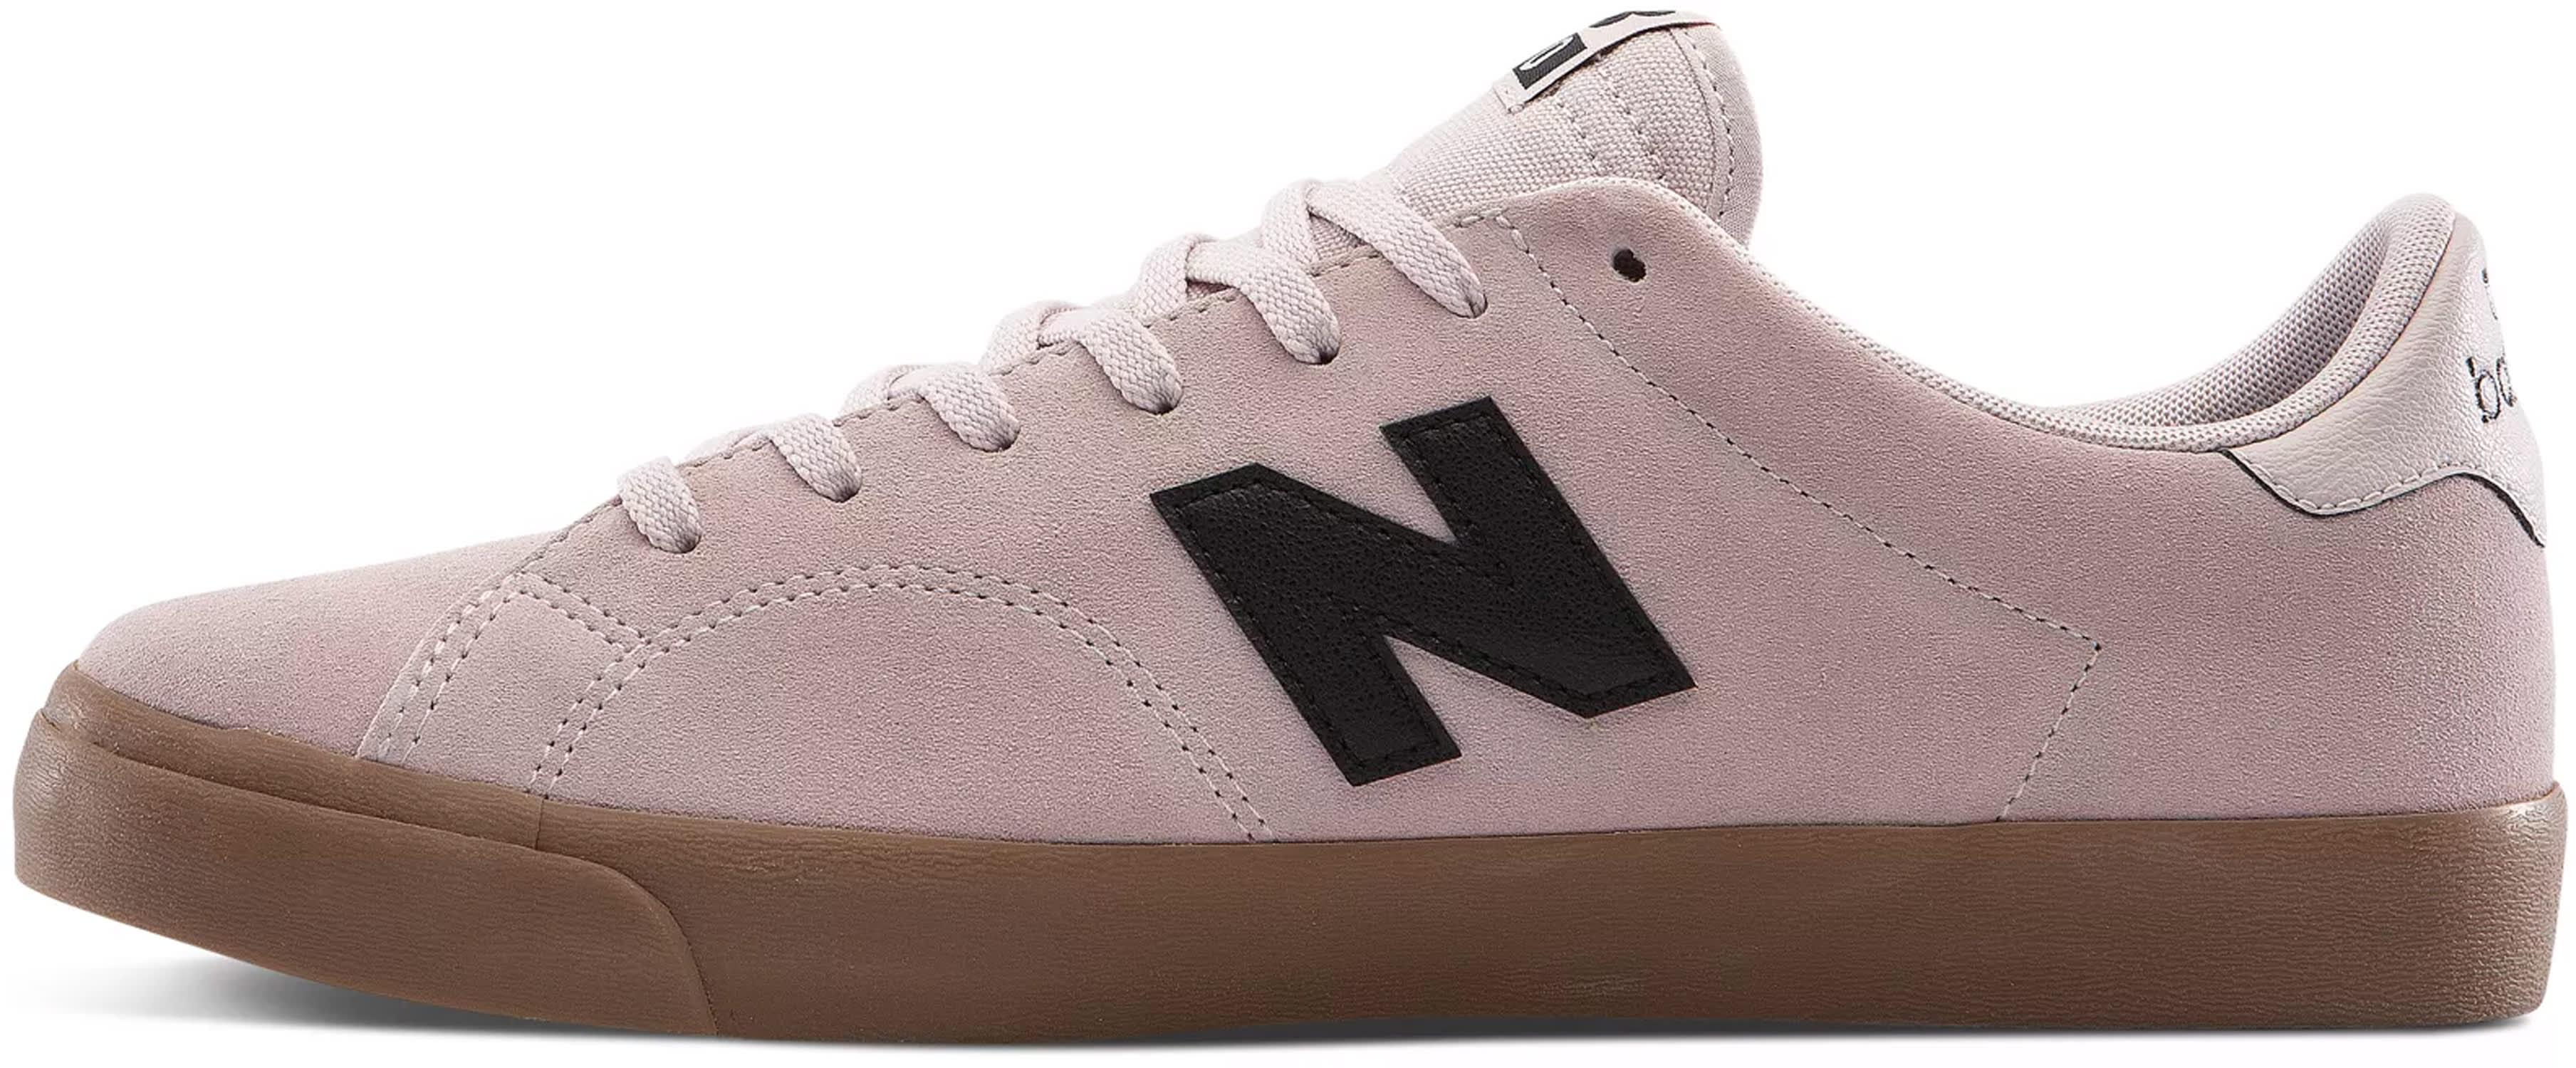 New Balance 210 Los Angeles Skate Shoes